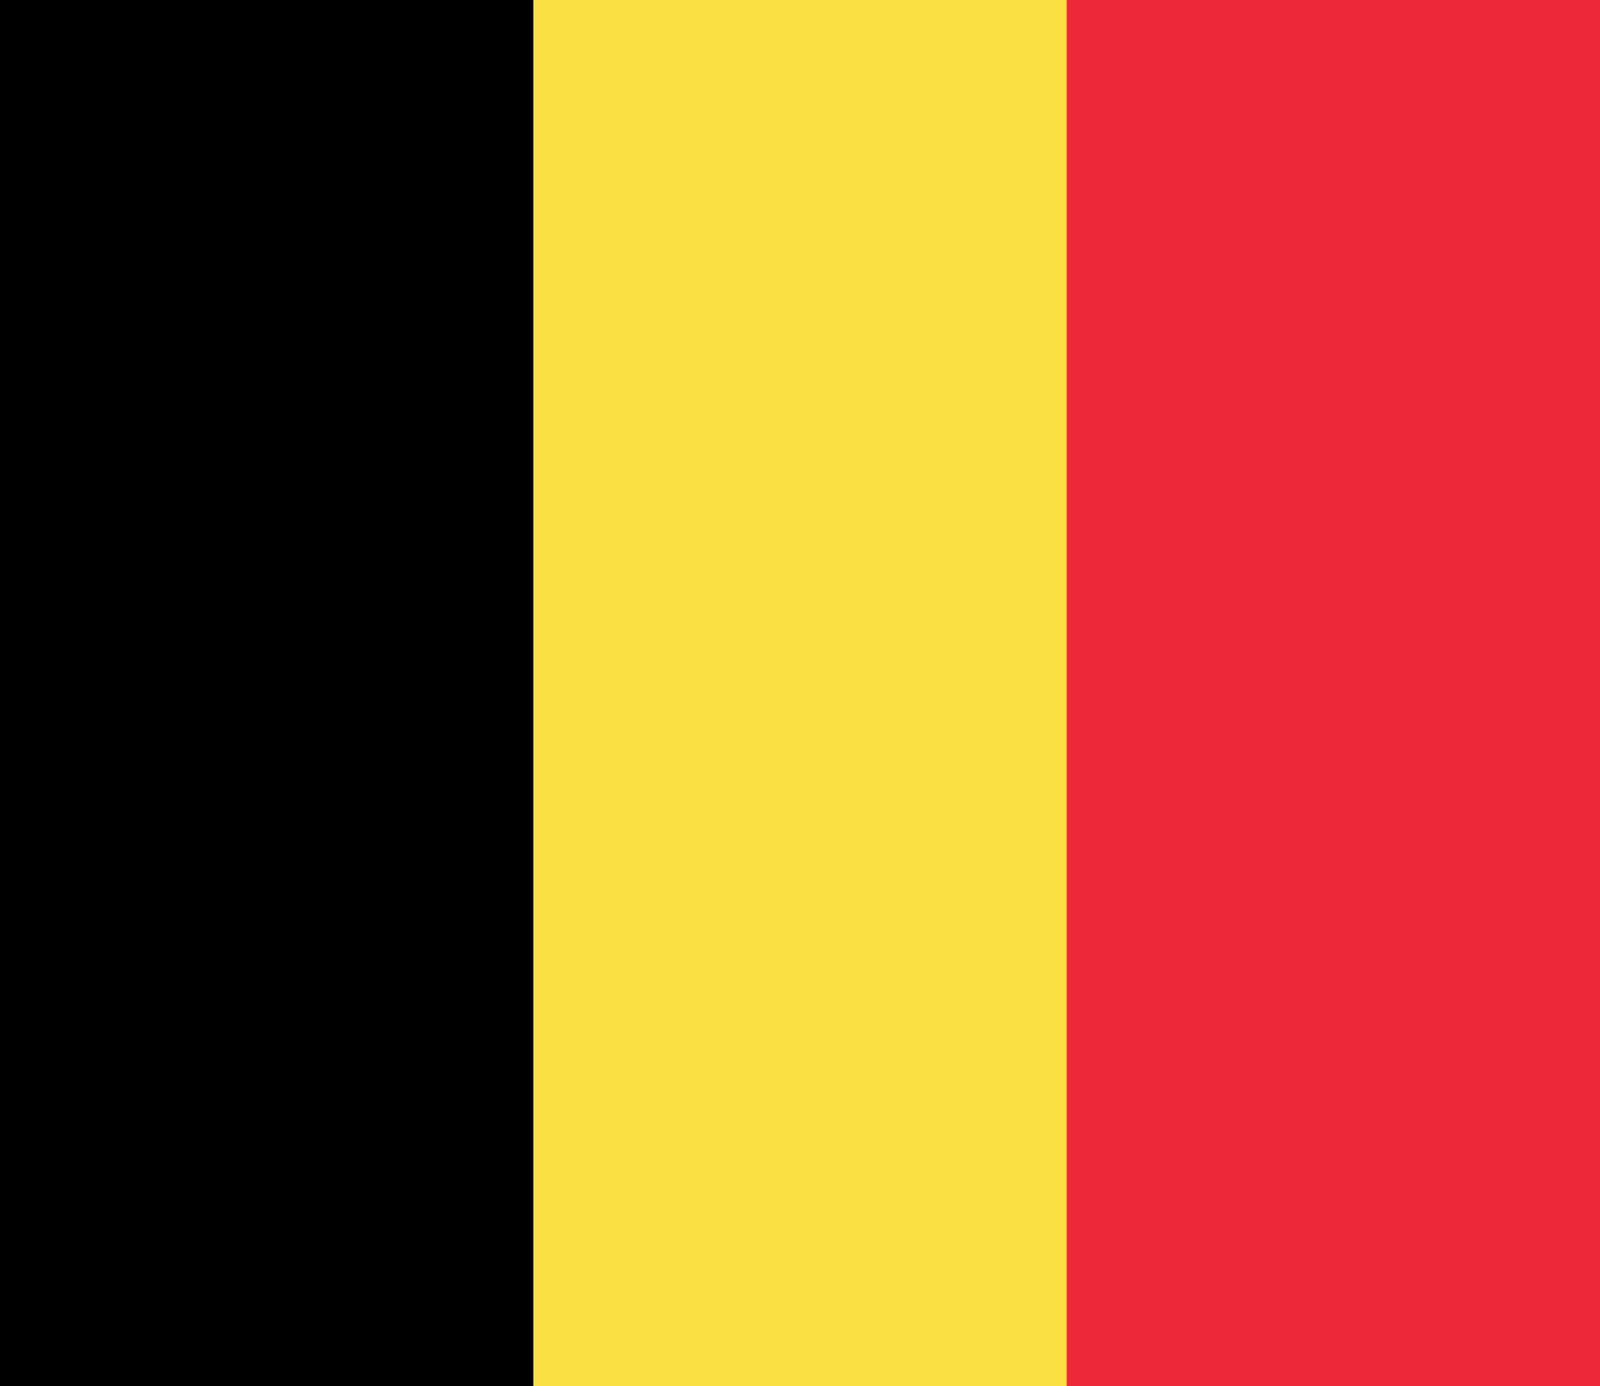 http://carbrandsincurrentproduction.blogspot.com.es/search/label/Belgium